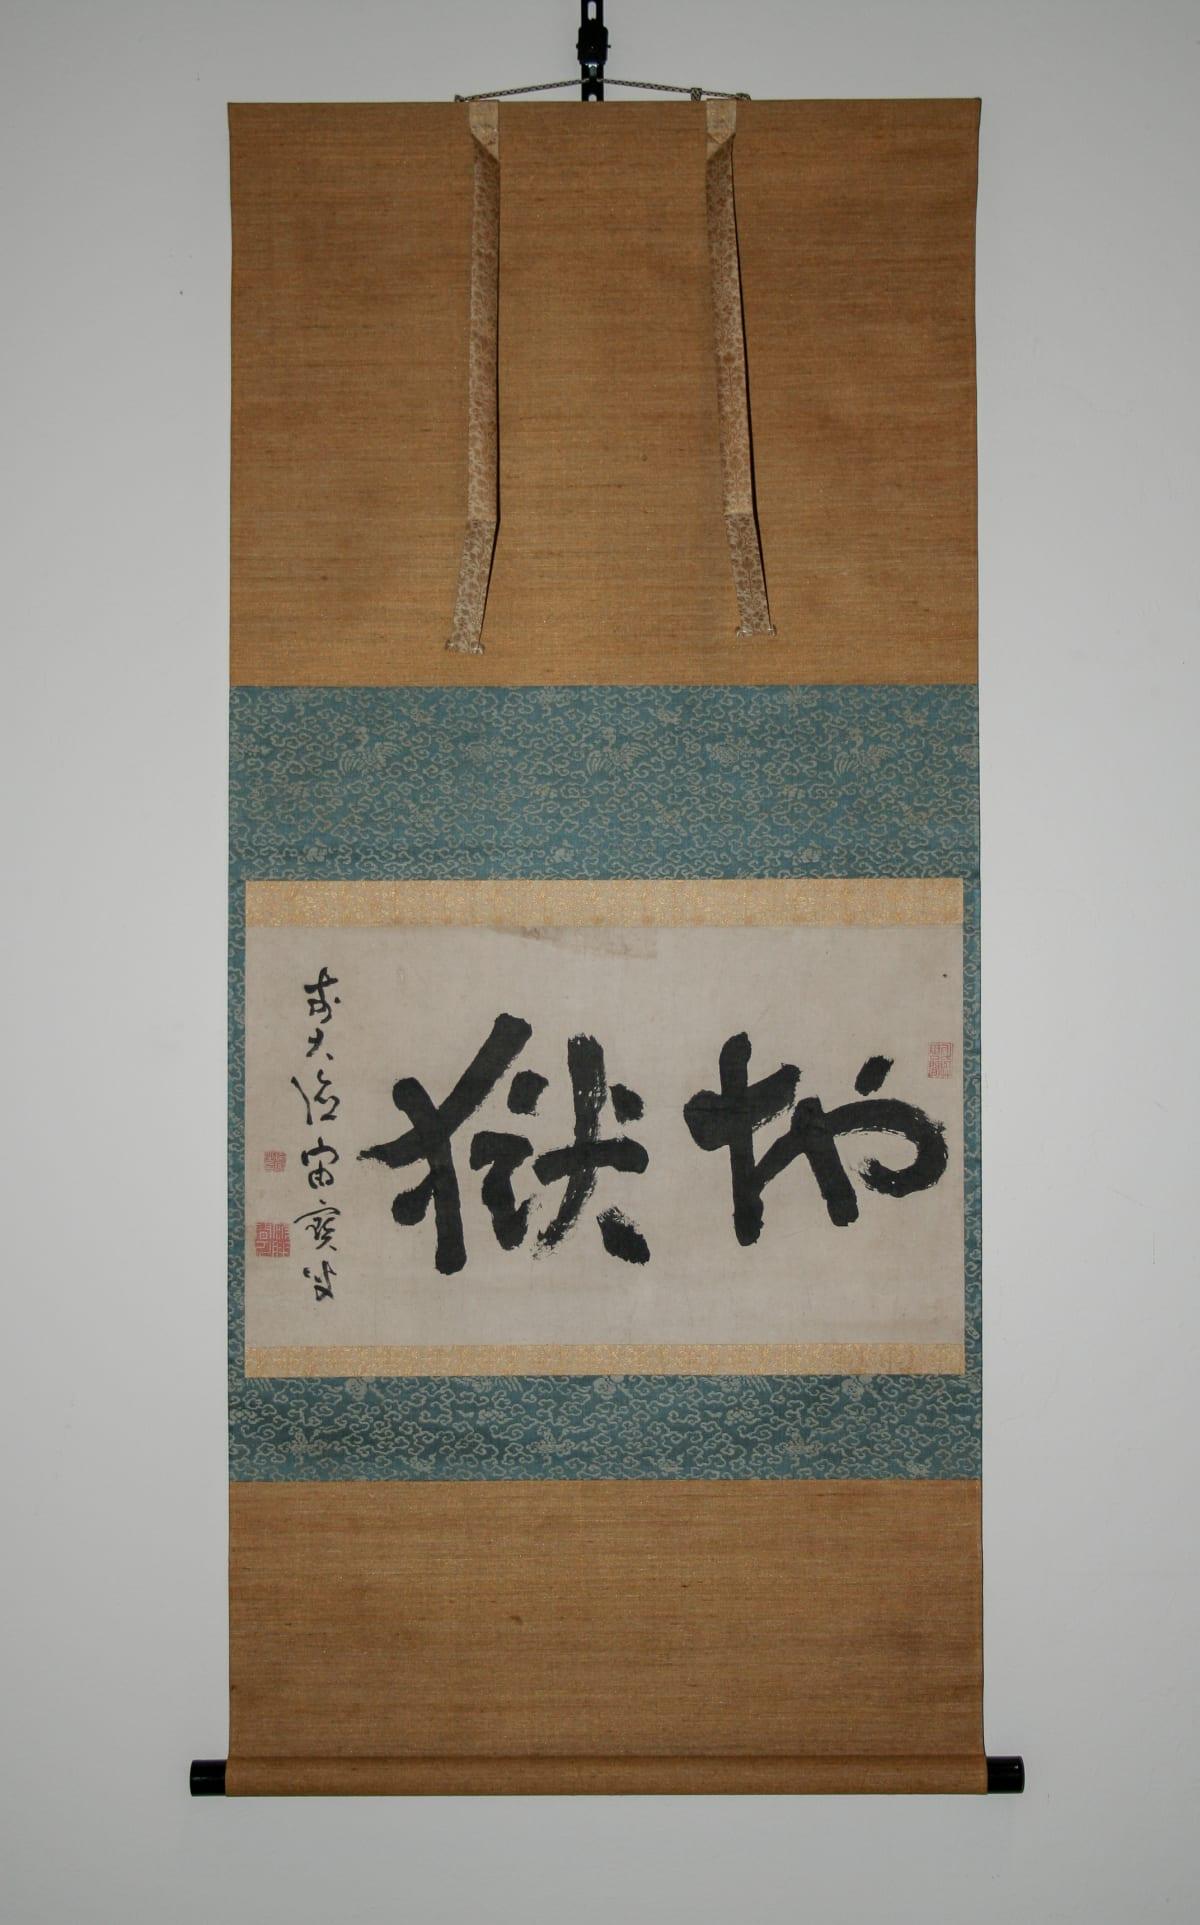 (Monk) Chuho-so-u (1758-1838), Jigoku, late 18th - early 19th century